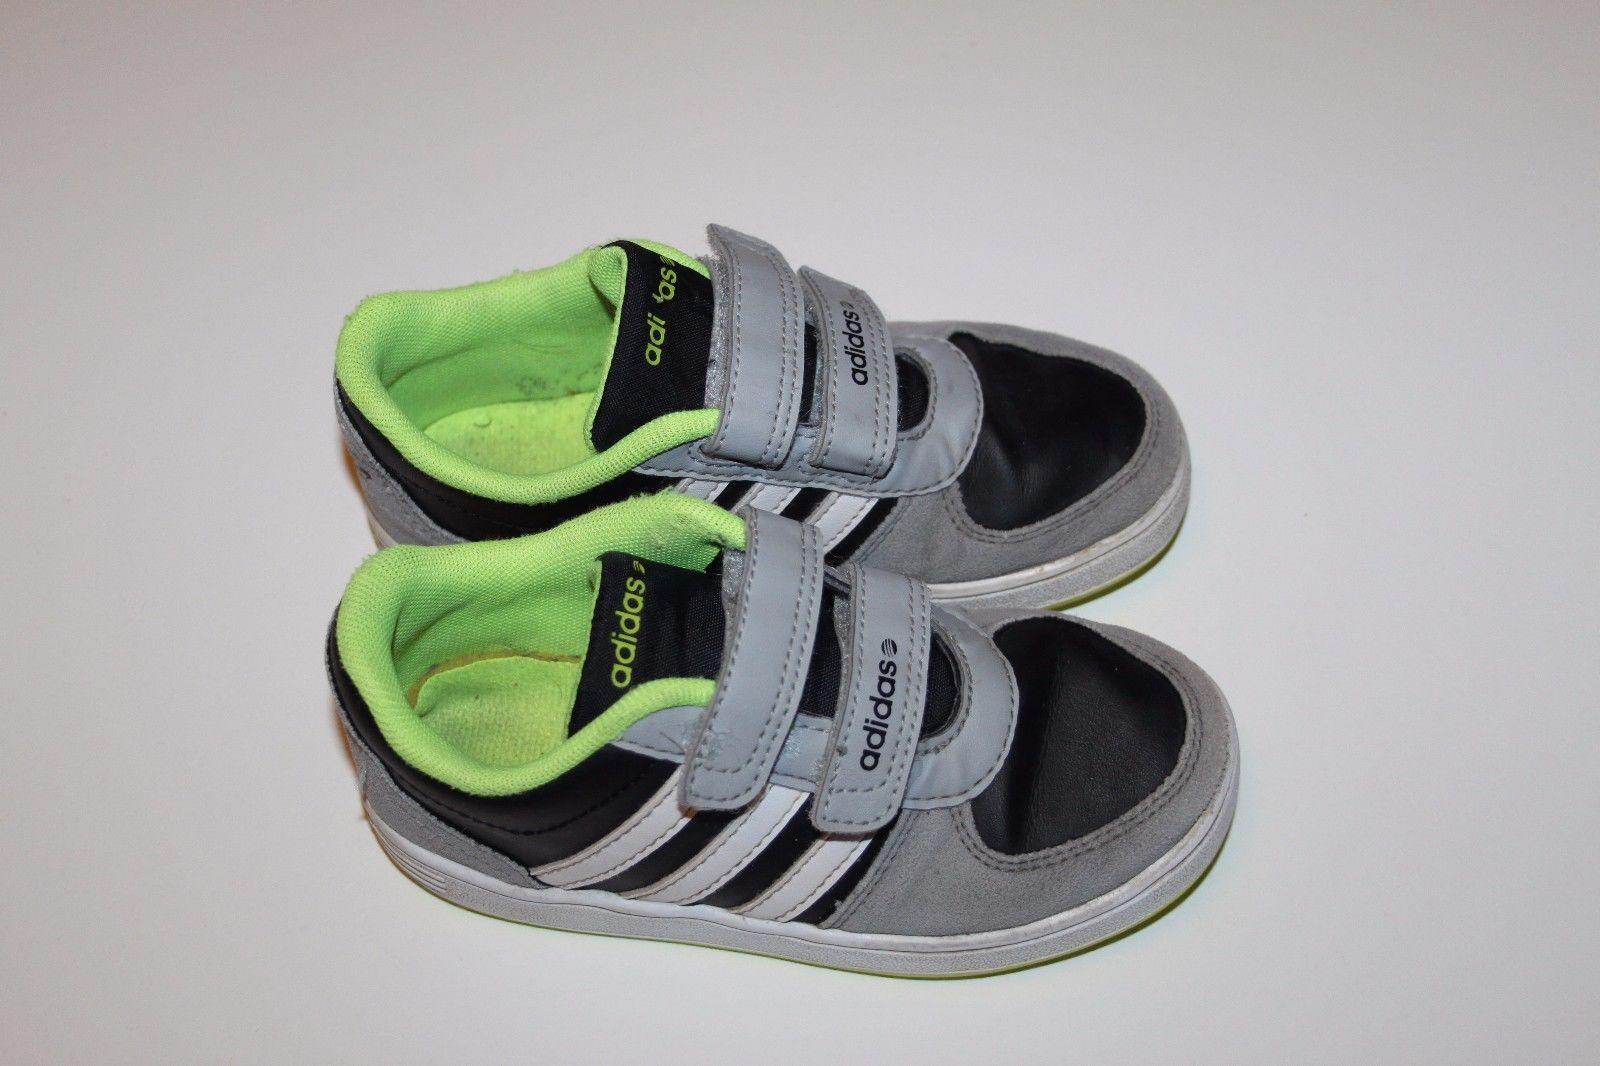 boys adidas trainers size 9